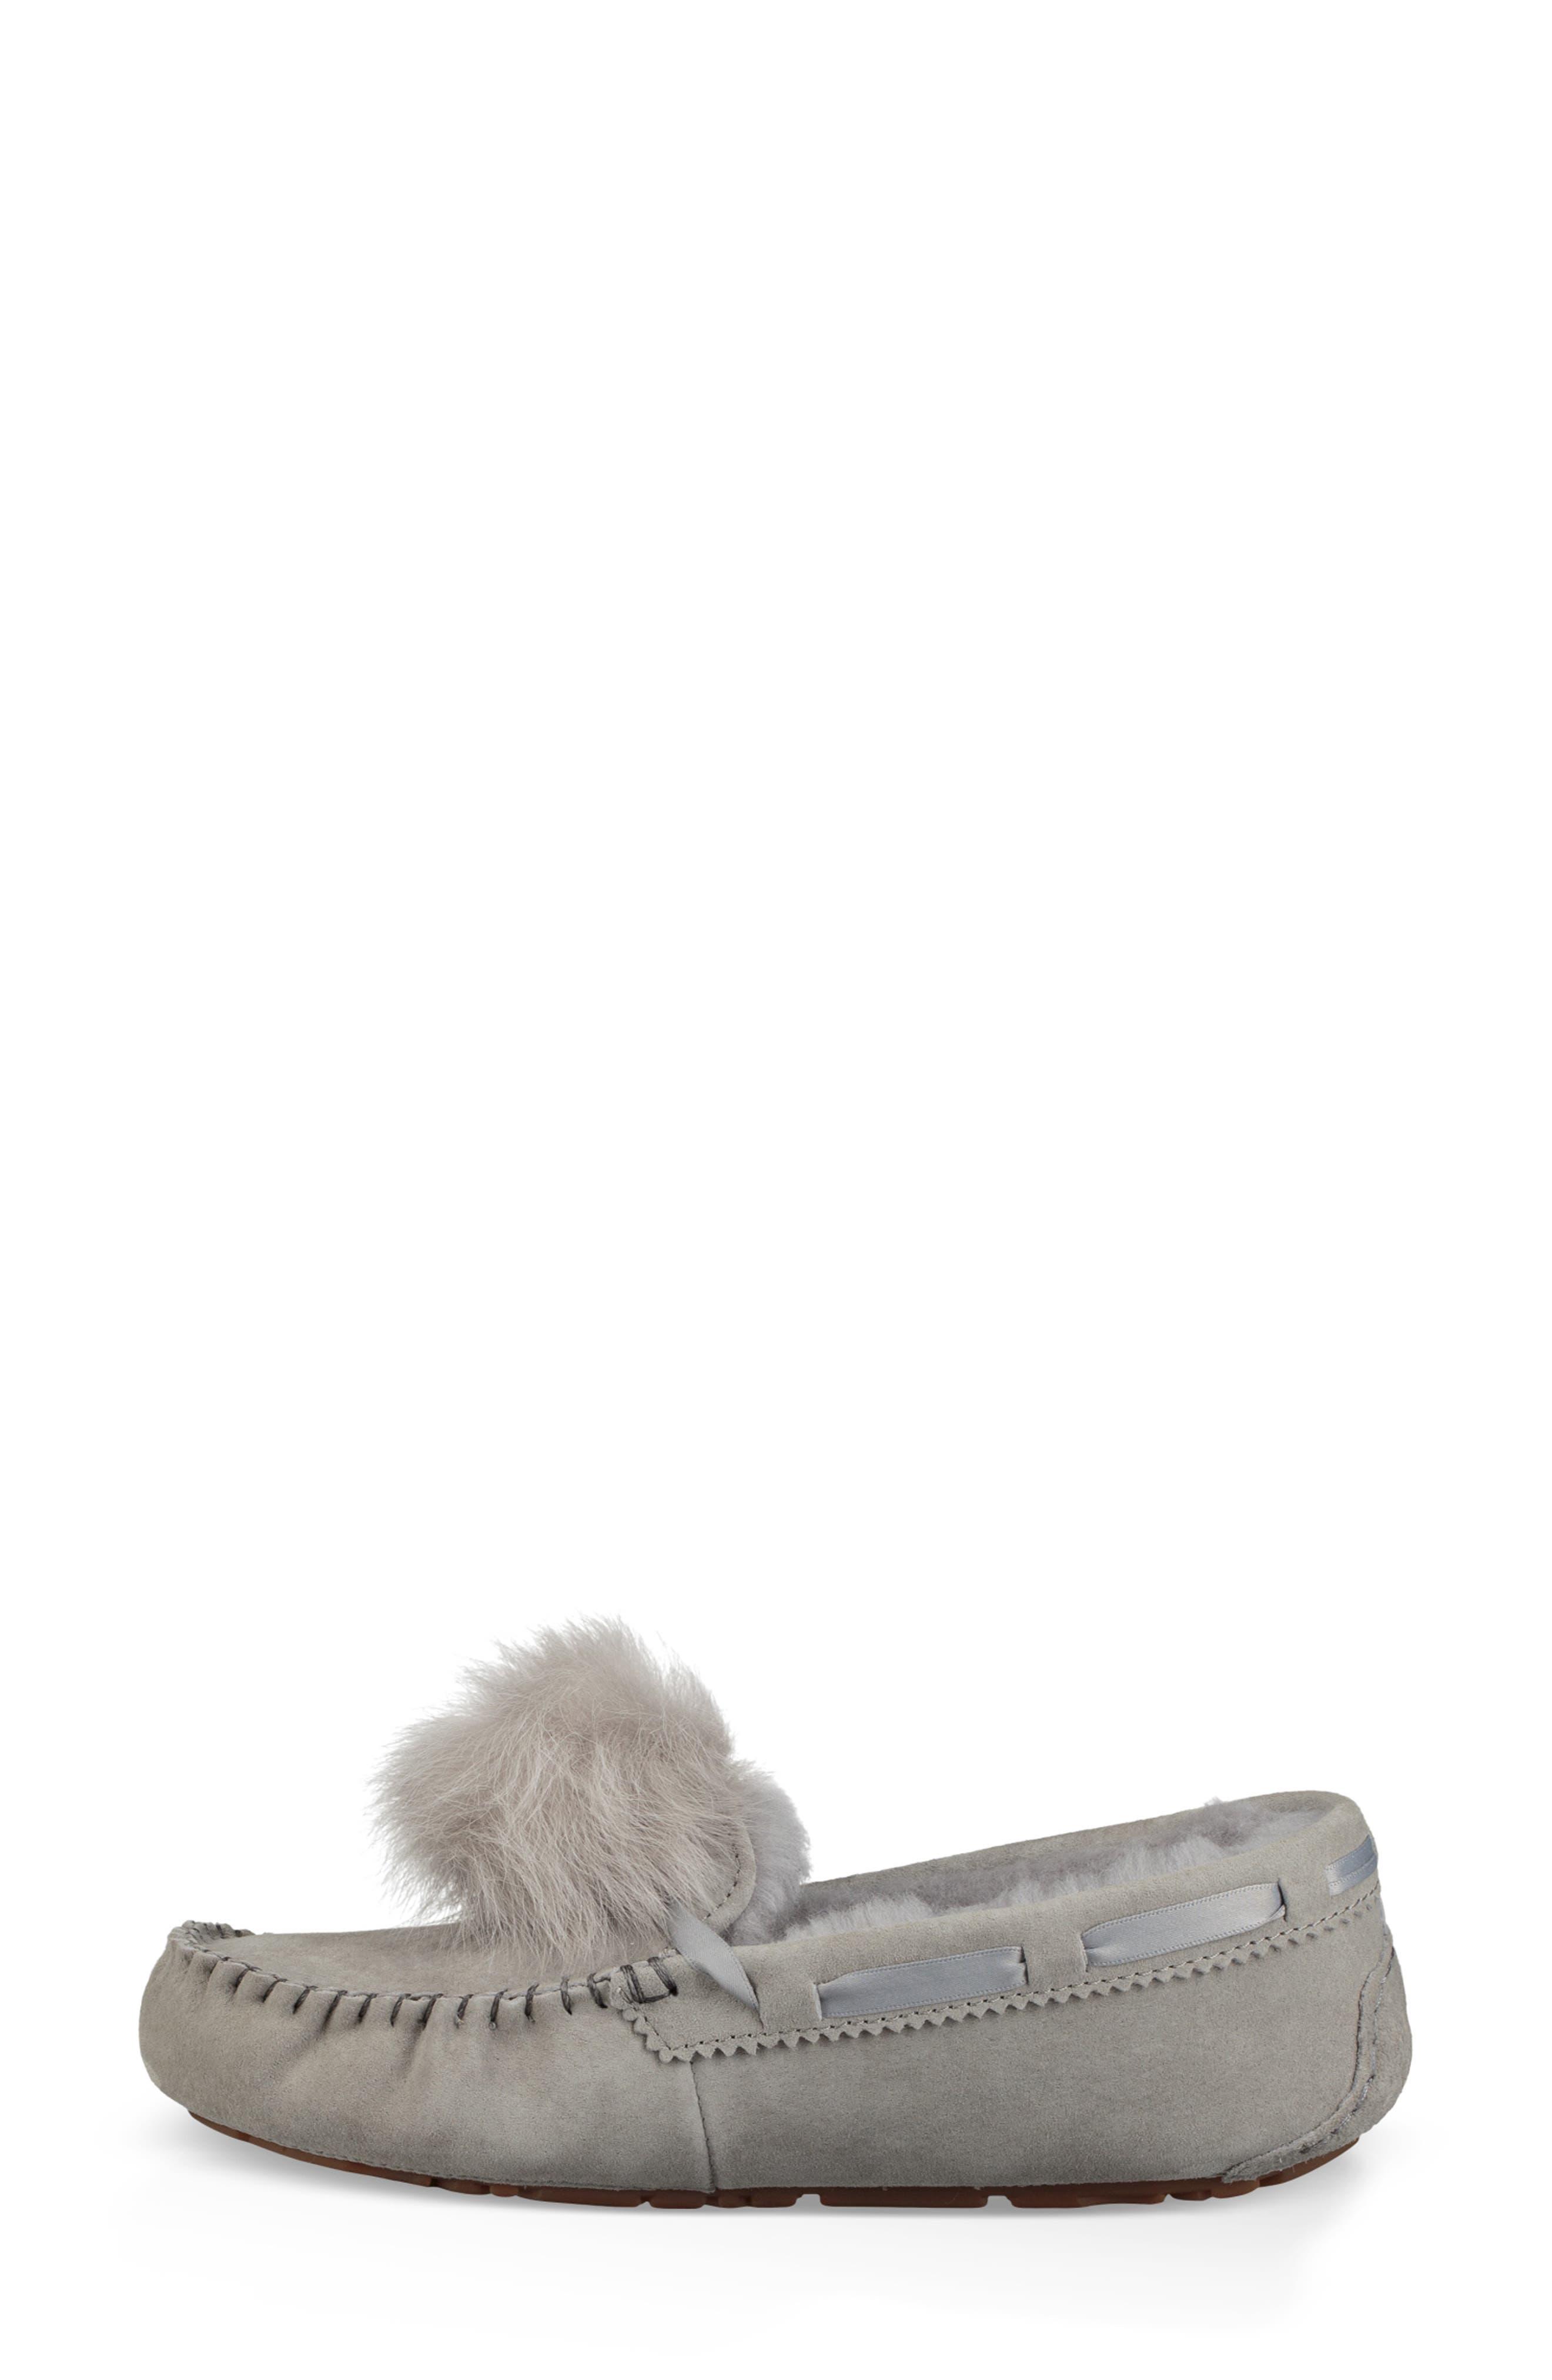 UGG<SUP>®</SUP>, Dakota Water Resistant Genuine Shearling Pompom Slipper, Alternate thumbnail 6, color, SEAL